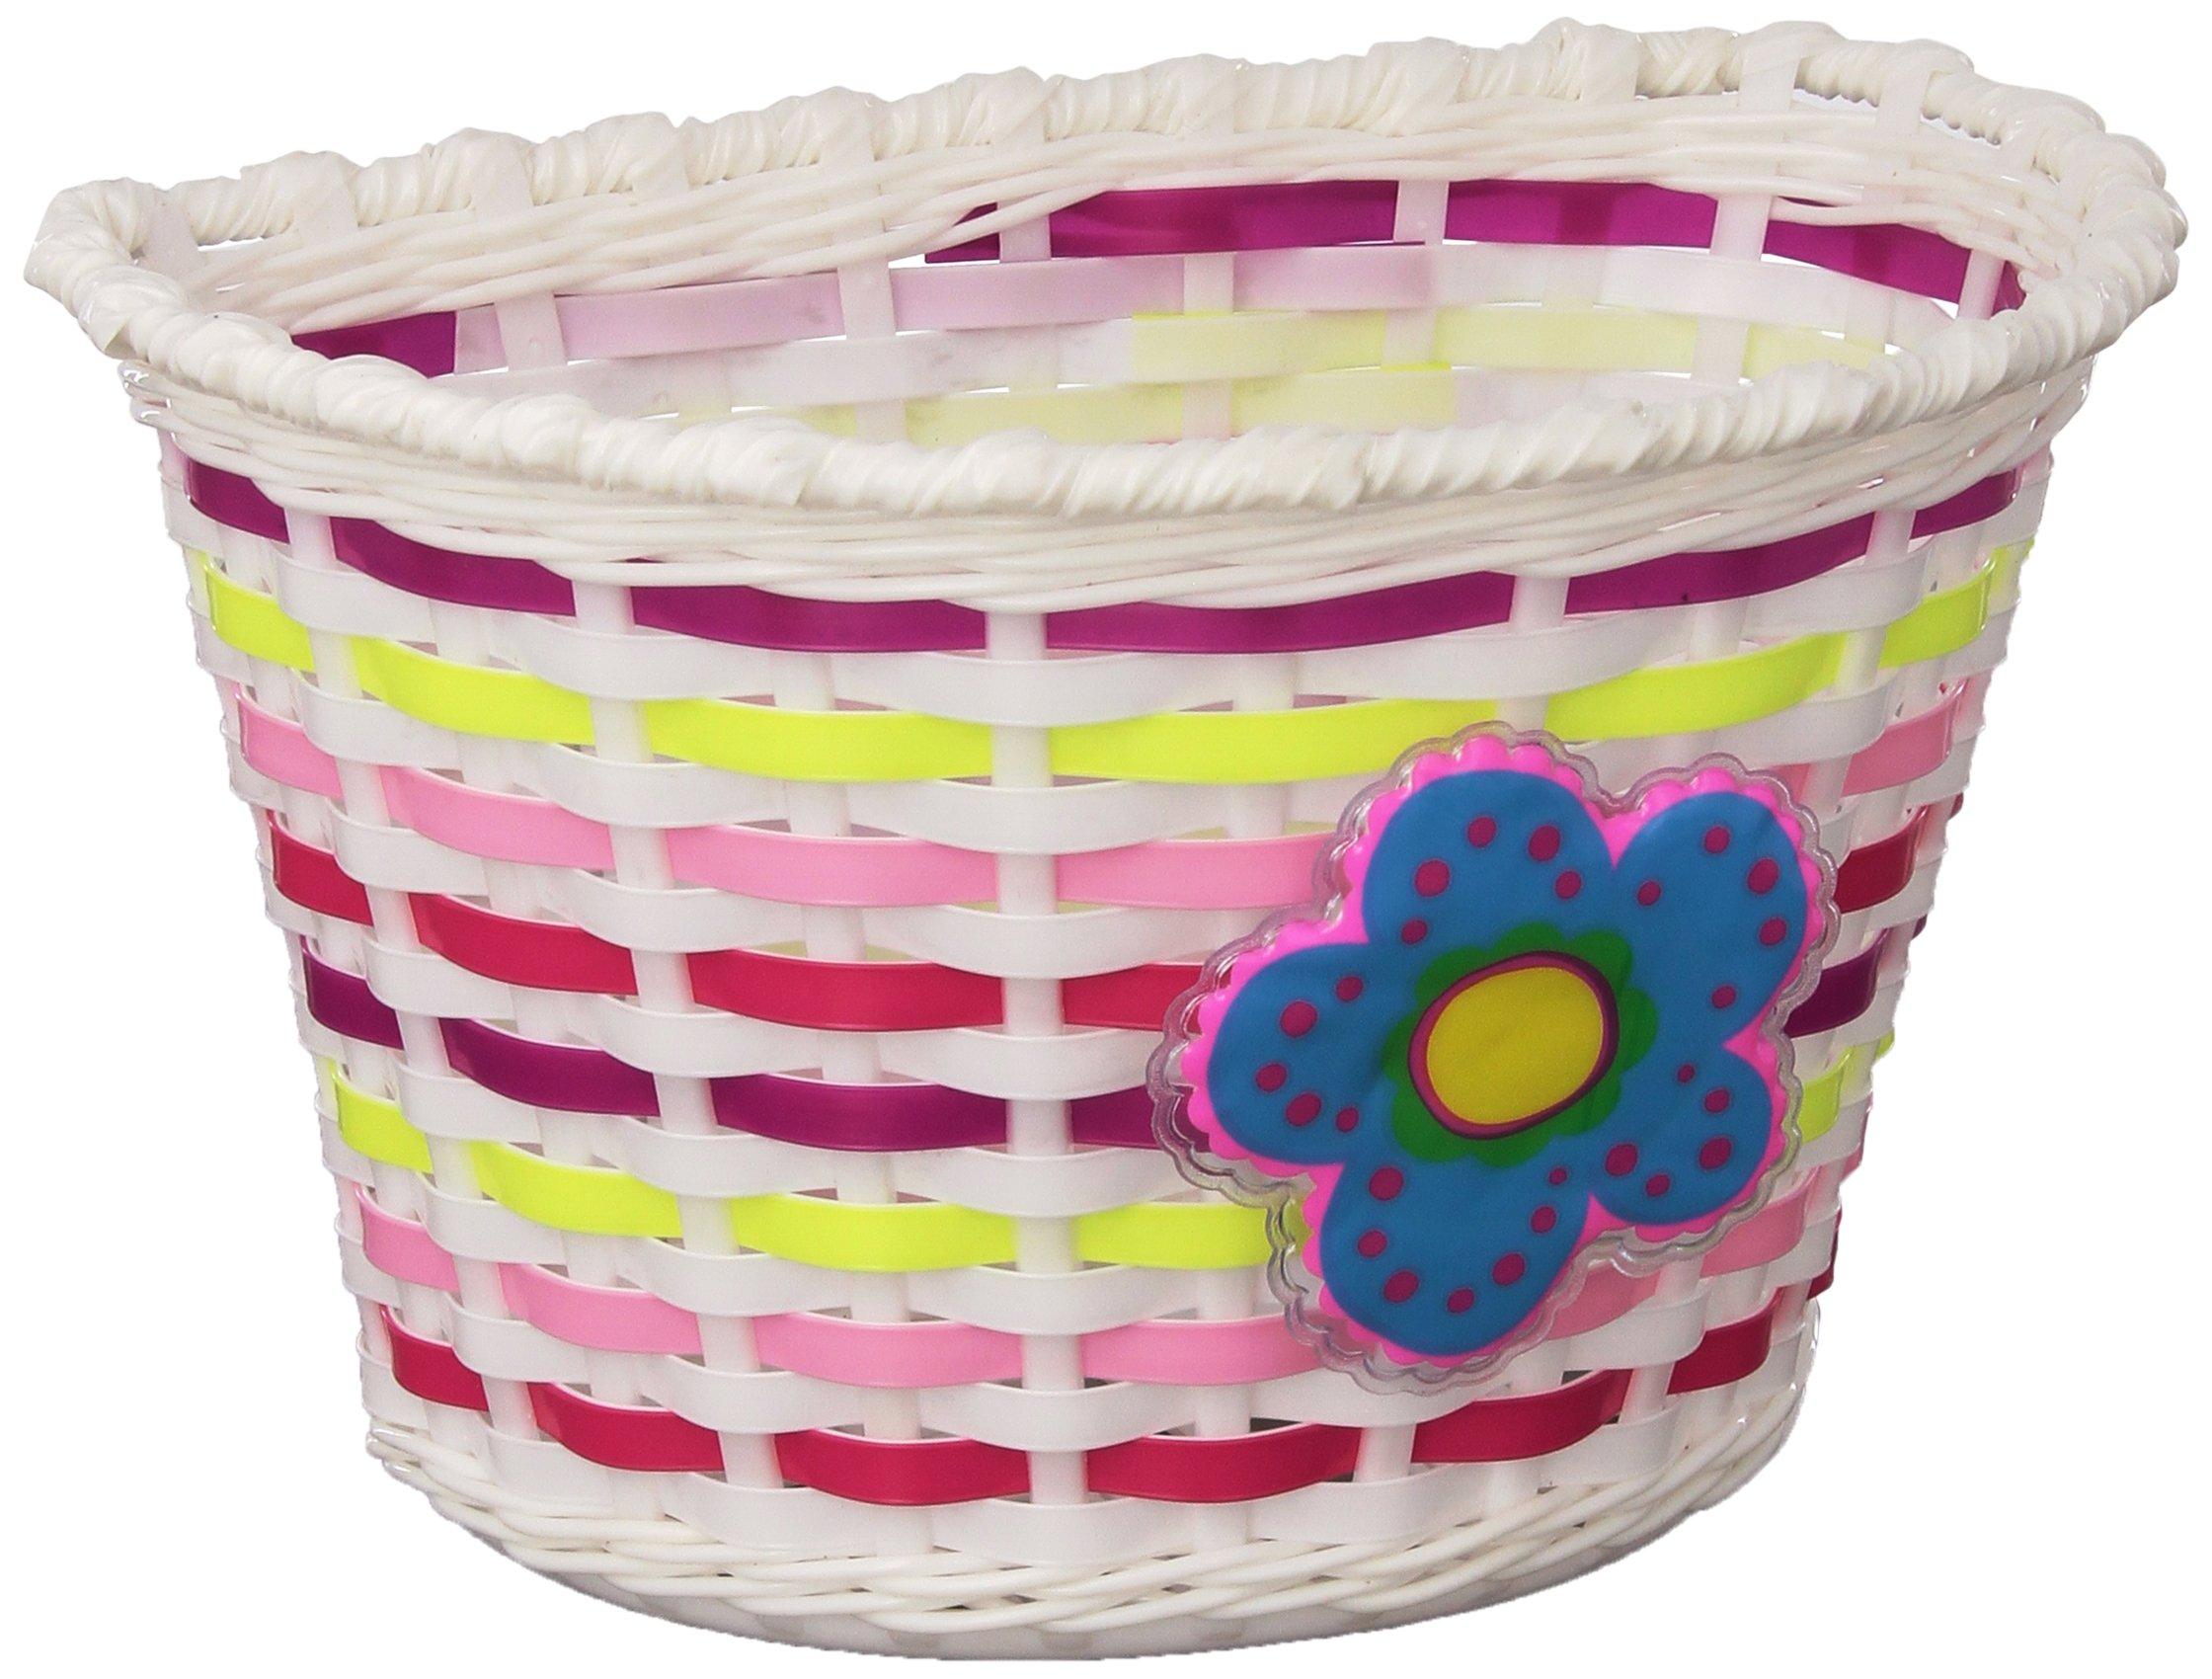 Schwinn Girl's Bicycle Basket